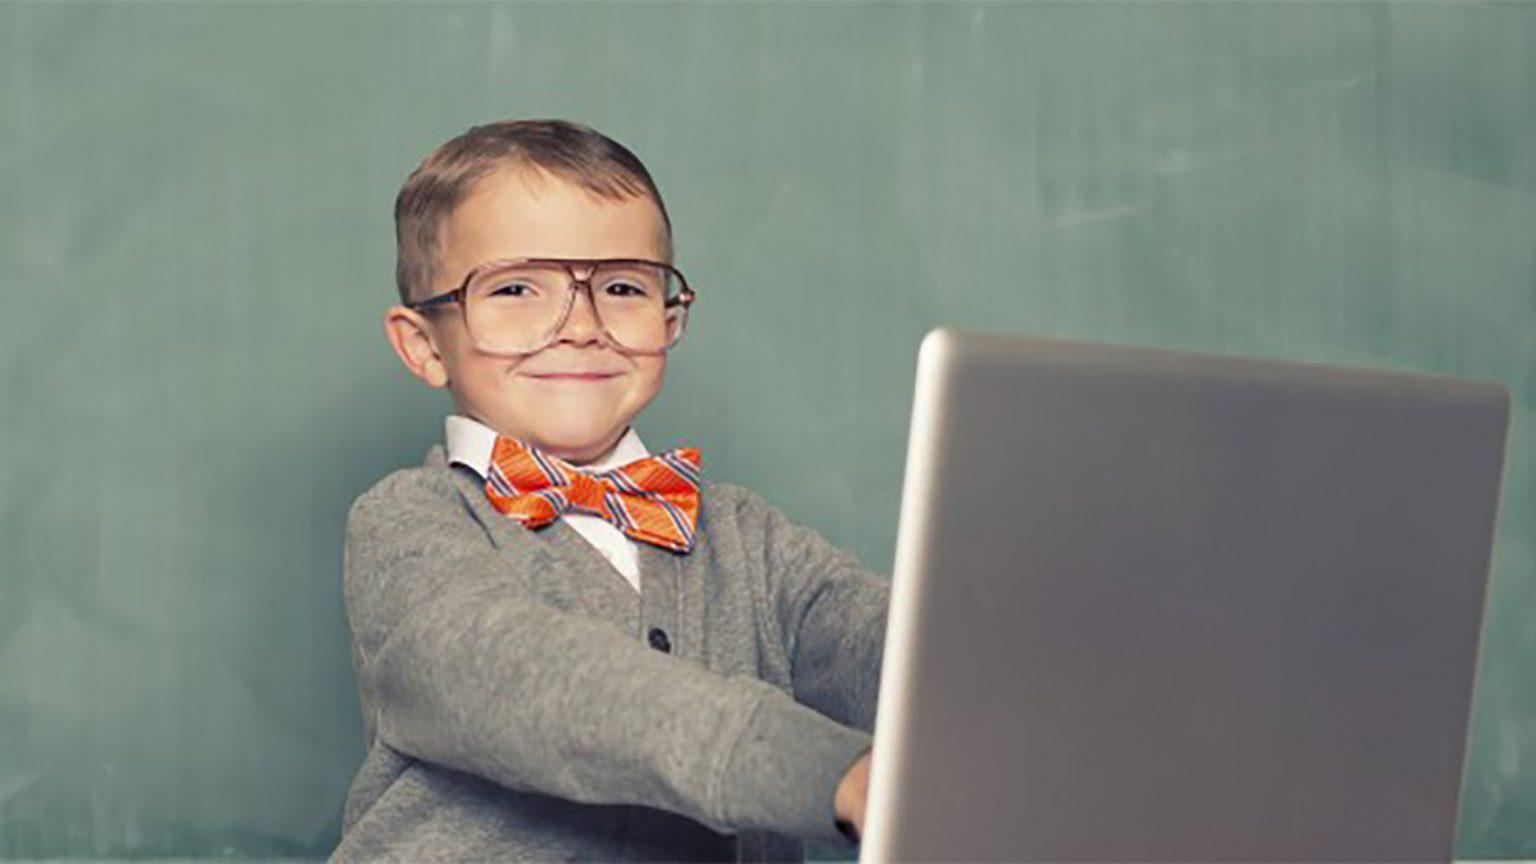 child laptop / ребёнок за ноутбуком